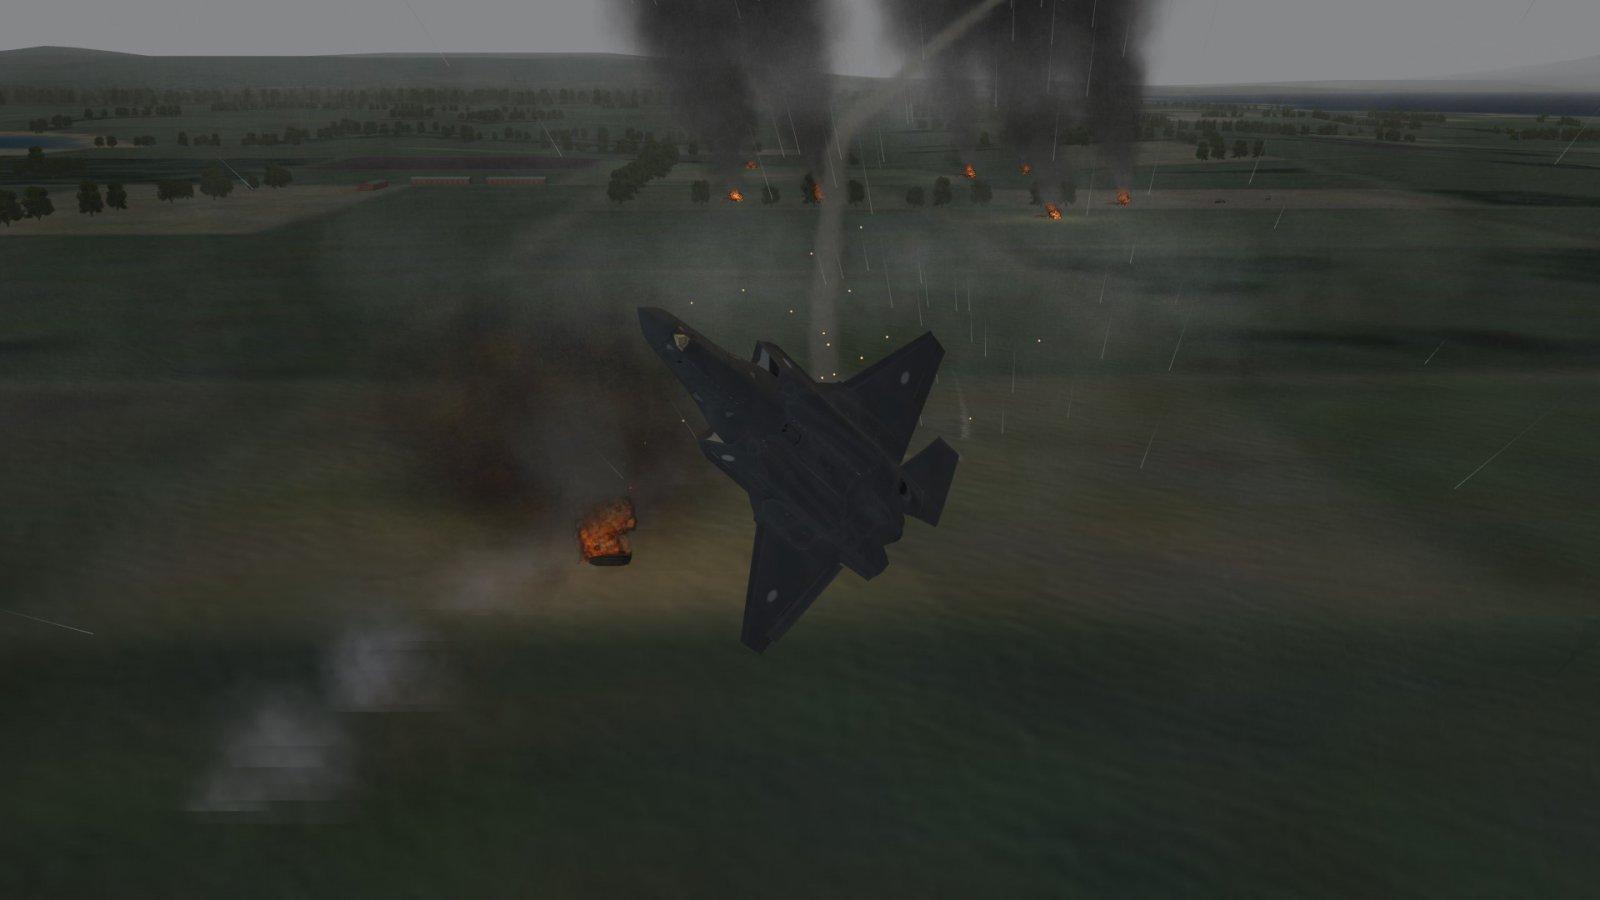 Broken F-35A Passing 2S6 It Strafed